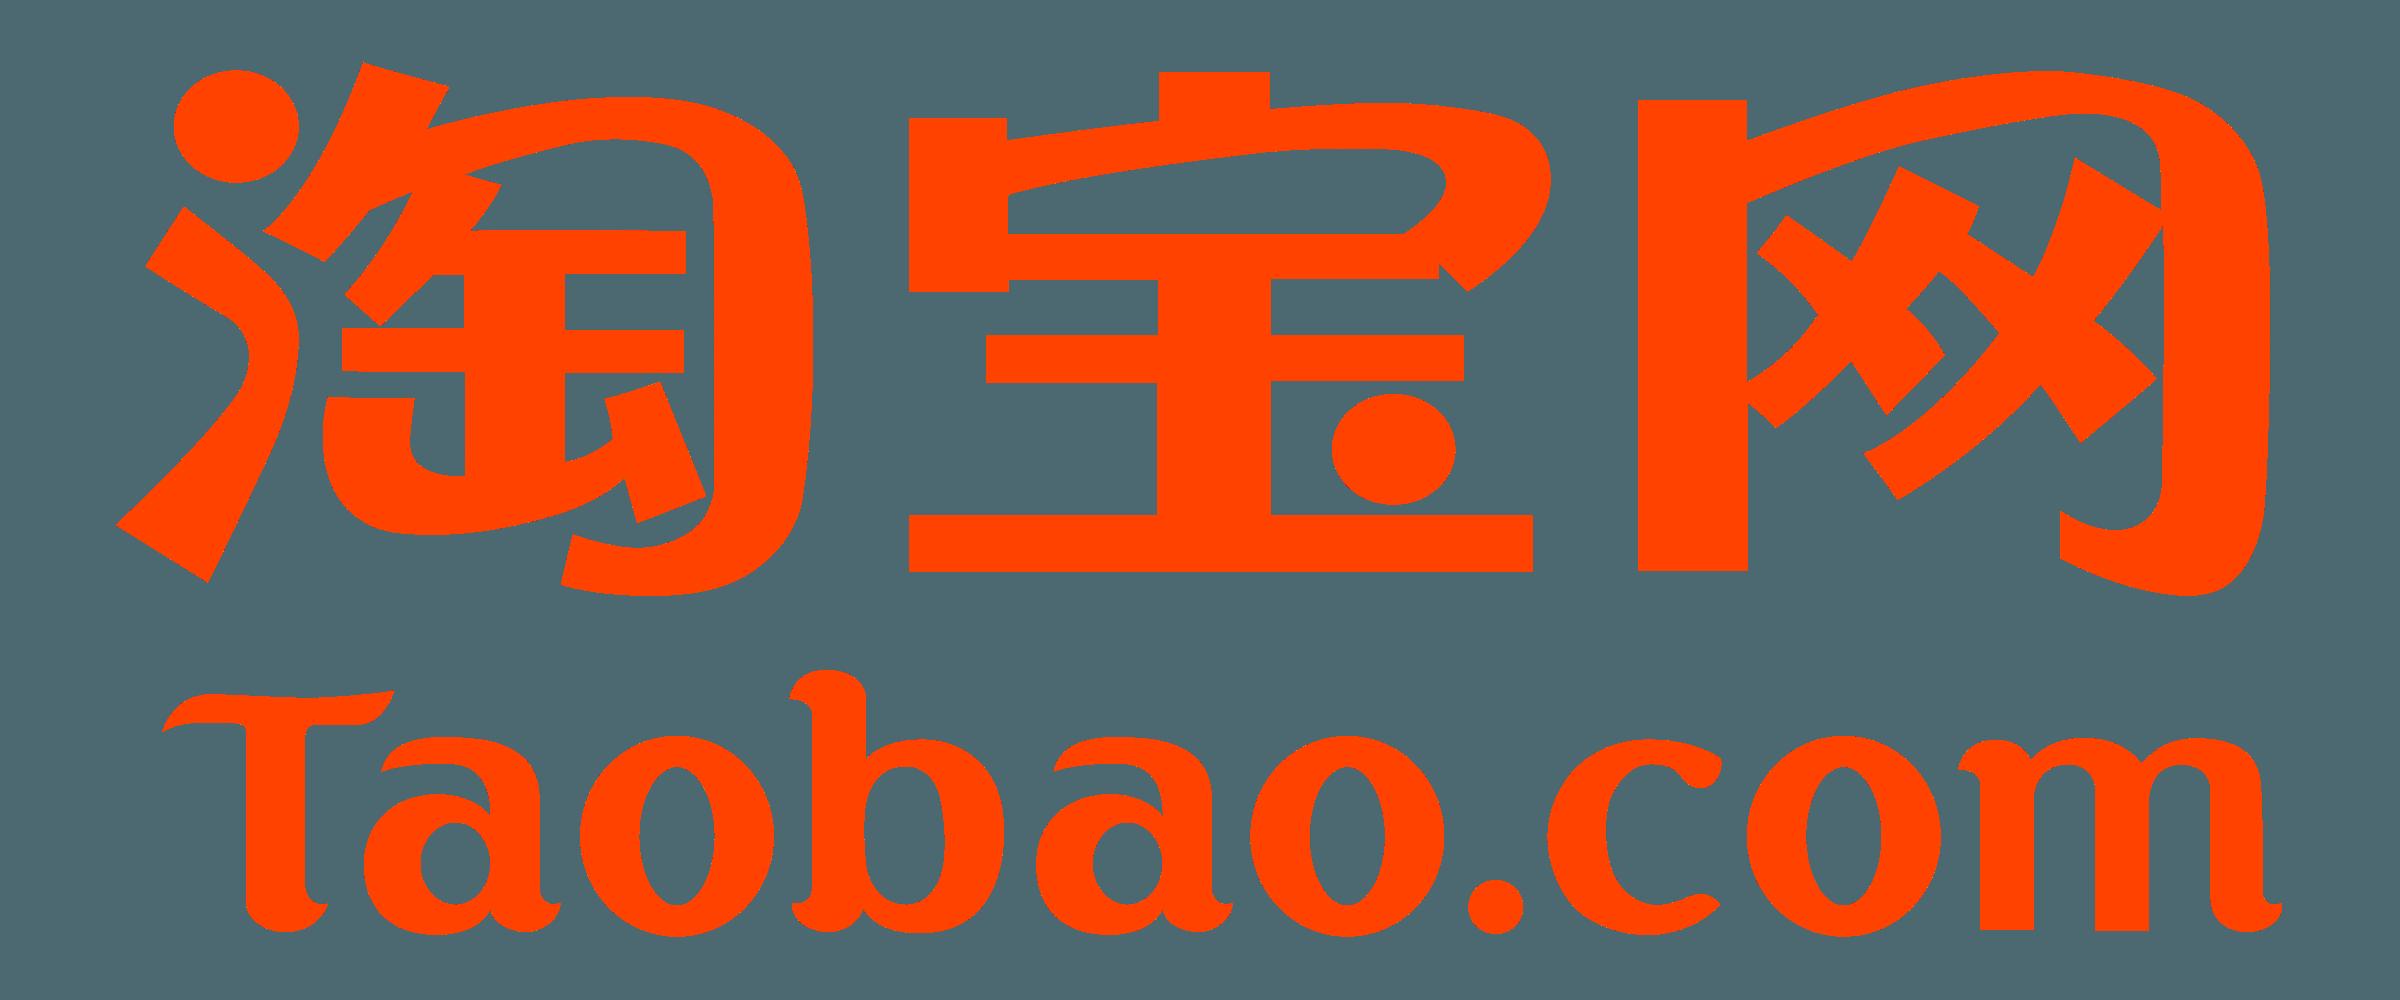 Taobao Logo PNG - Taobao Logo Vector PNG